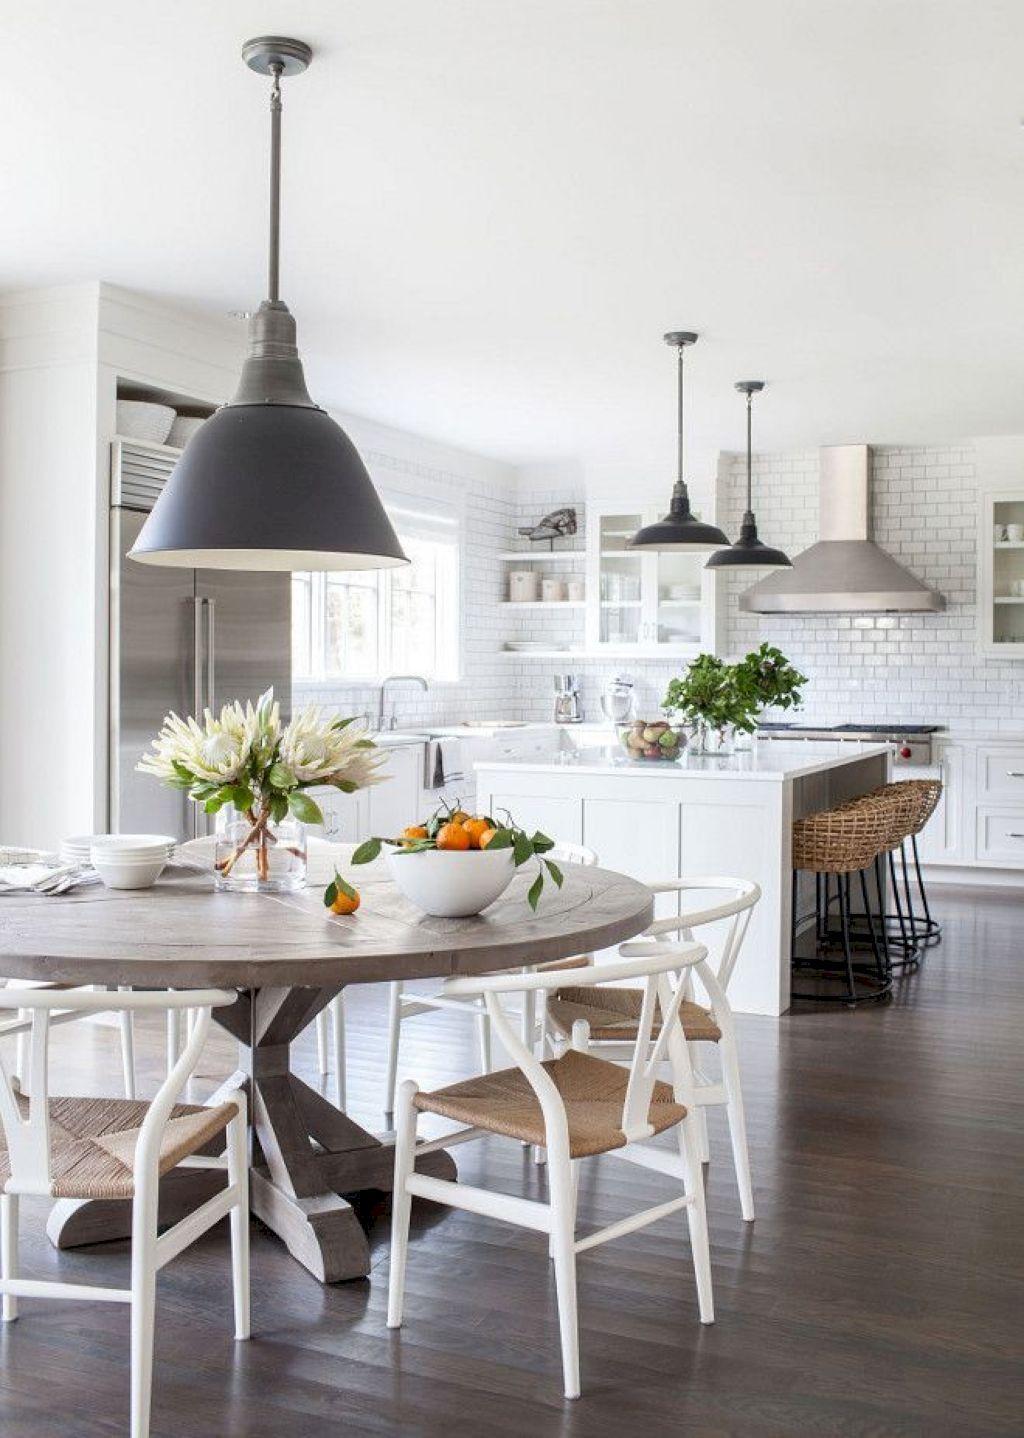 65 Beautiful Farmhouse Dining Room Table Design Ideas ...